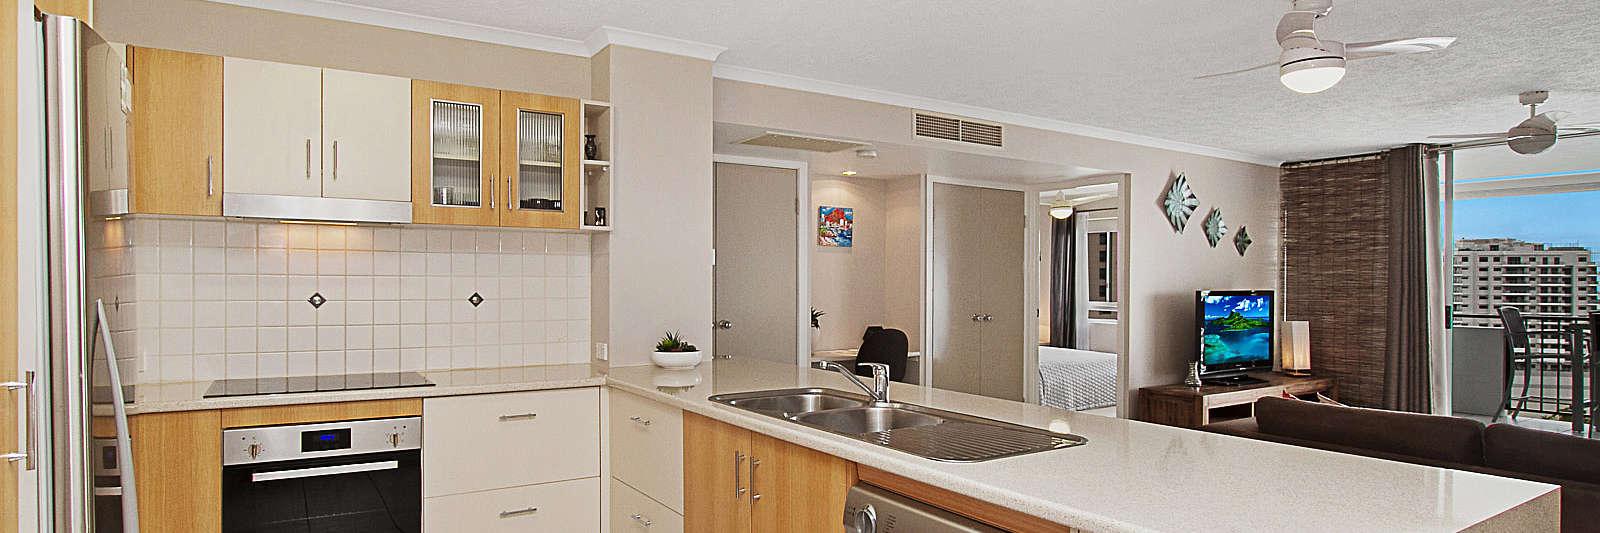 Highpoint Apartment